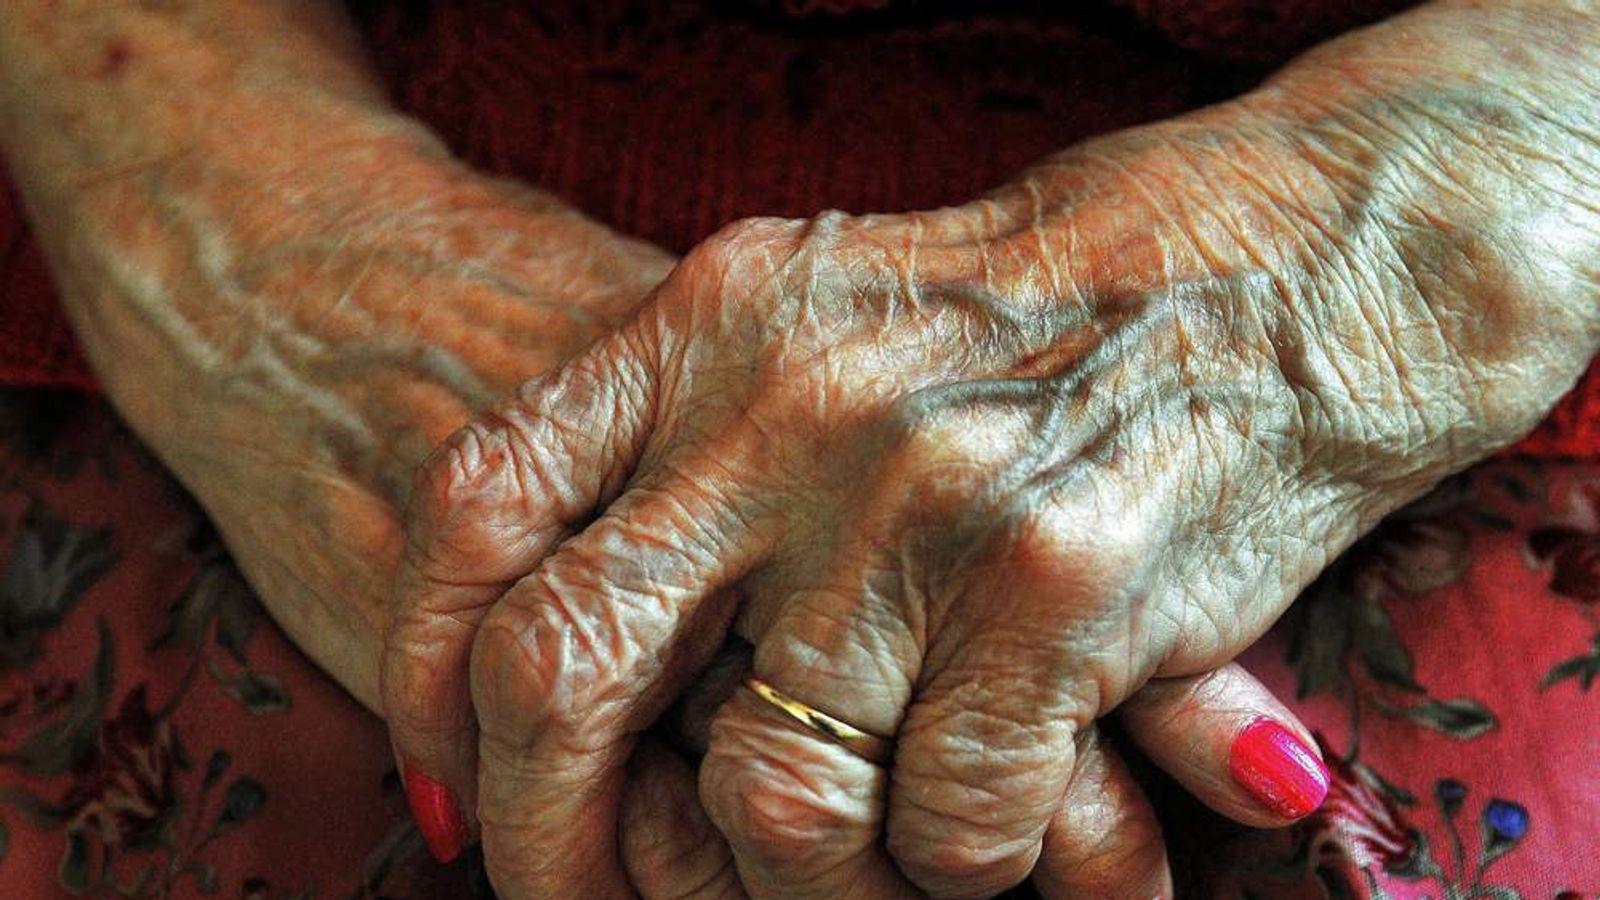 Dementia research 'decades behind'